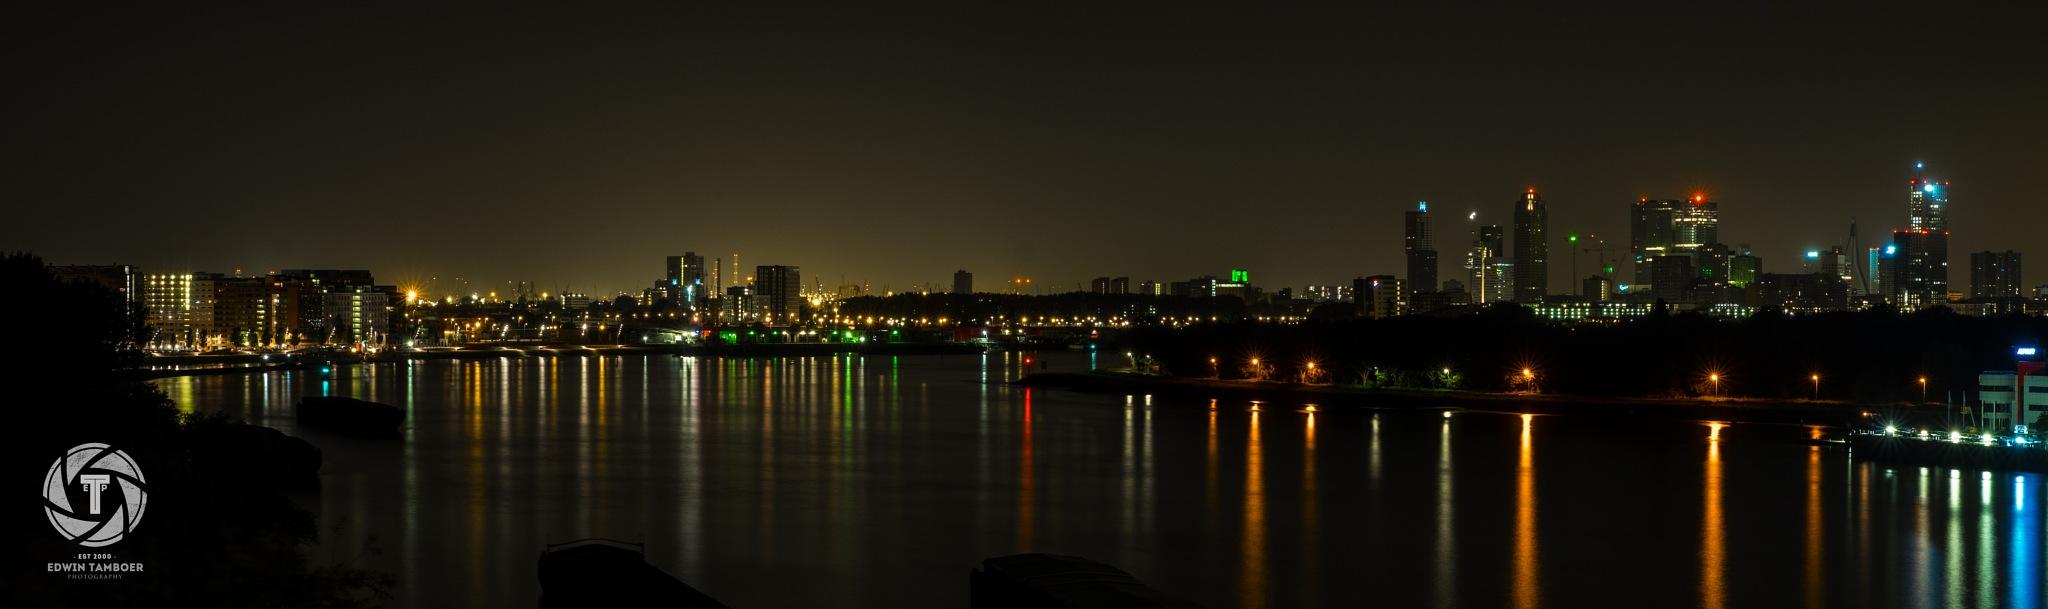 Rotterdam Skyline by Edwin Tamboer fotografie